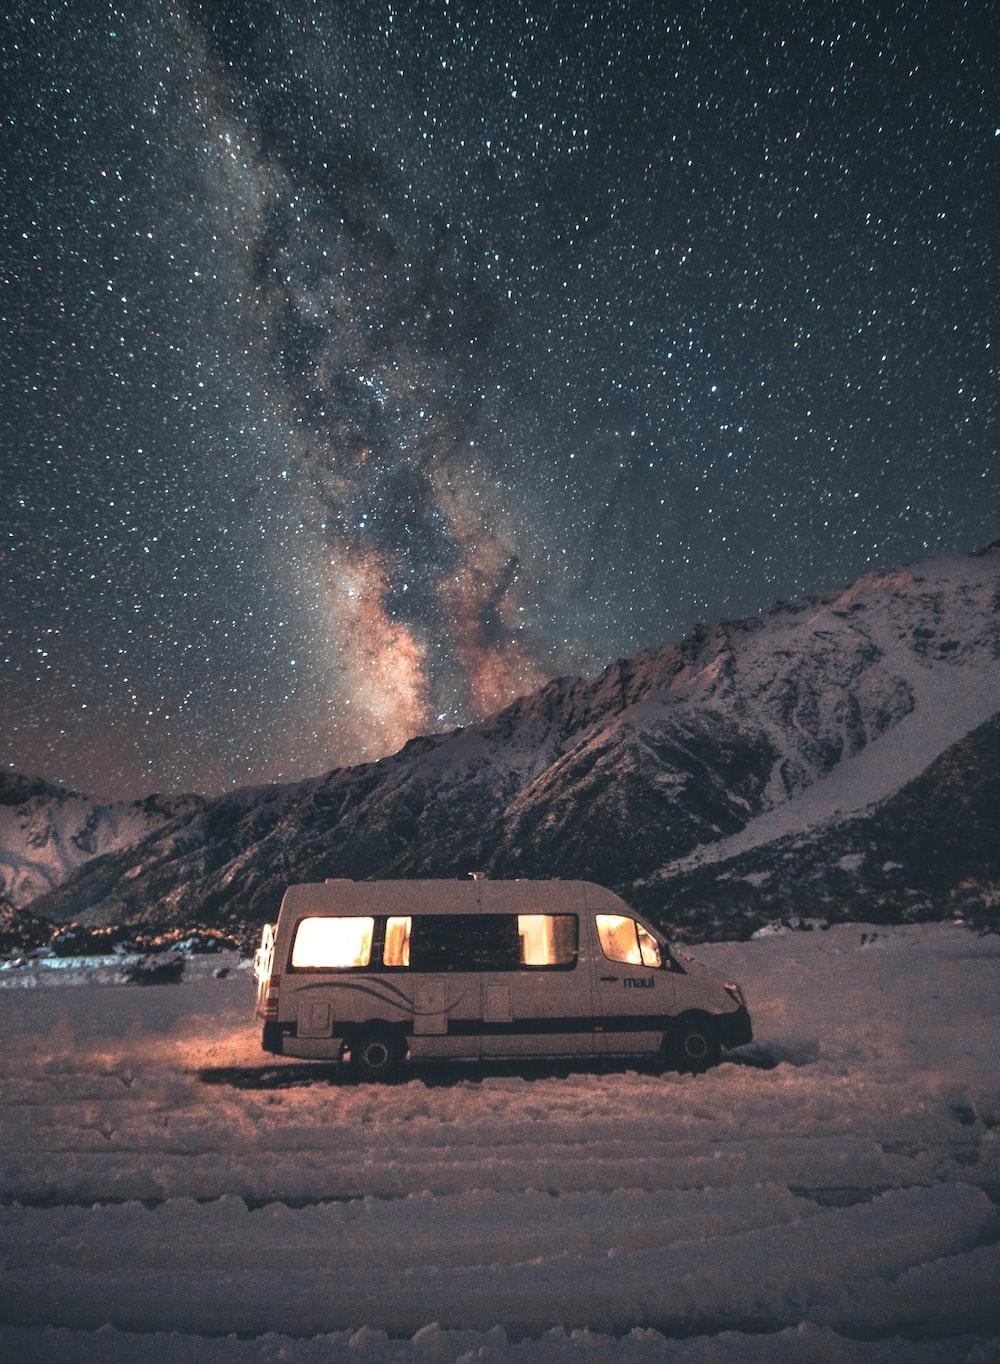 white minivan parked on snow during nighttime